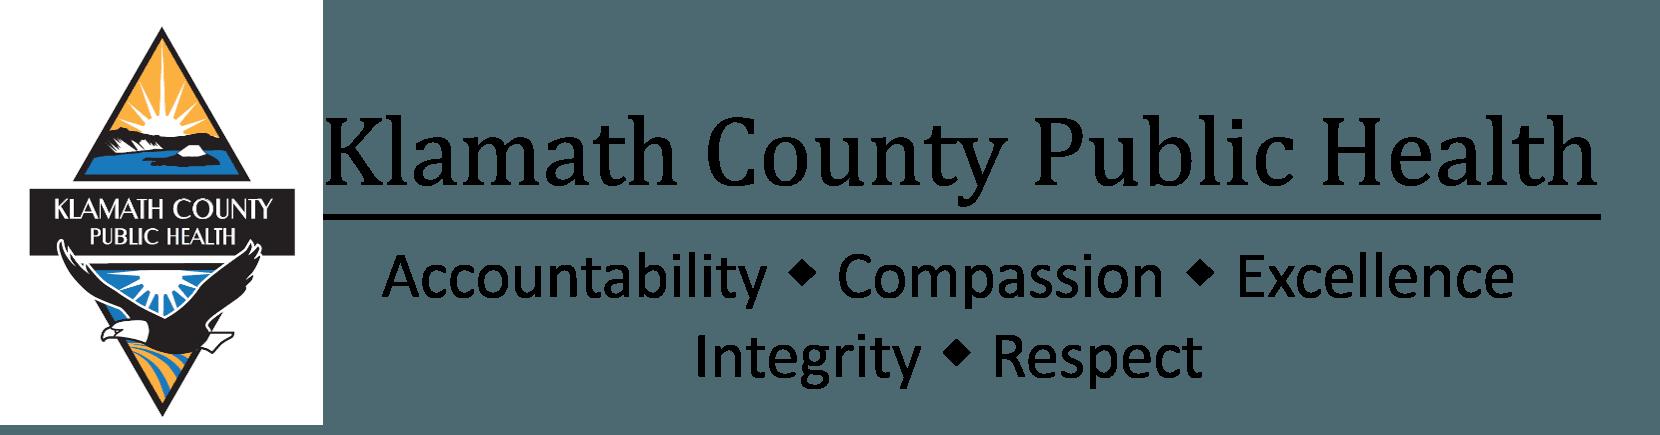 vital records - birth & death certificates | klamath county, or